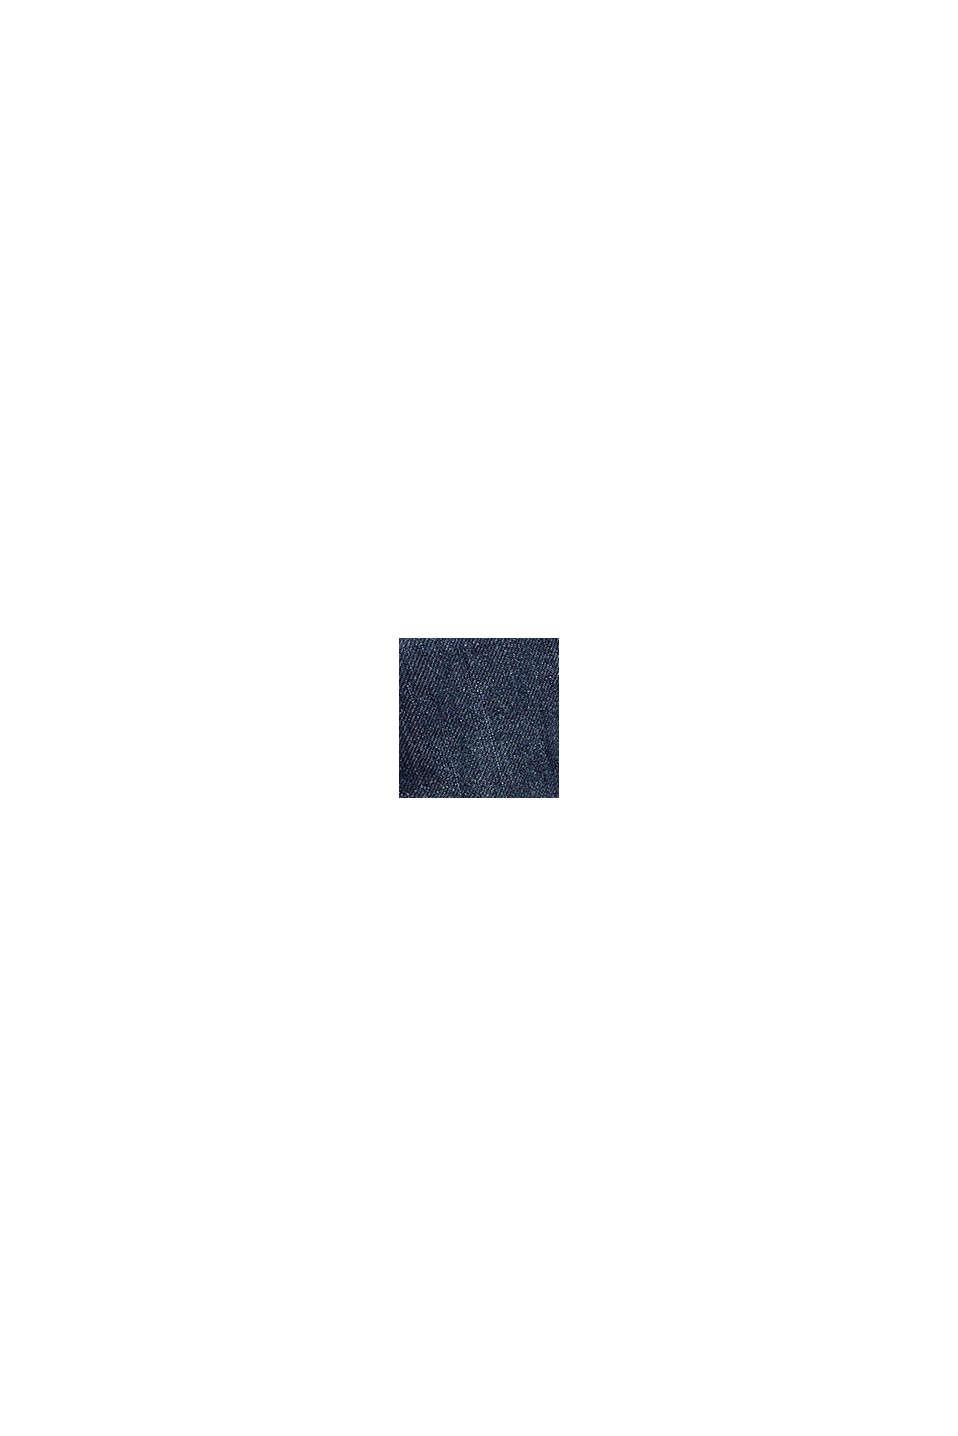 Jeans met verstelbare band en jersey voering, BLUE MEDIUM WASHED, swatch